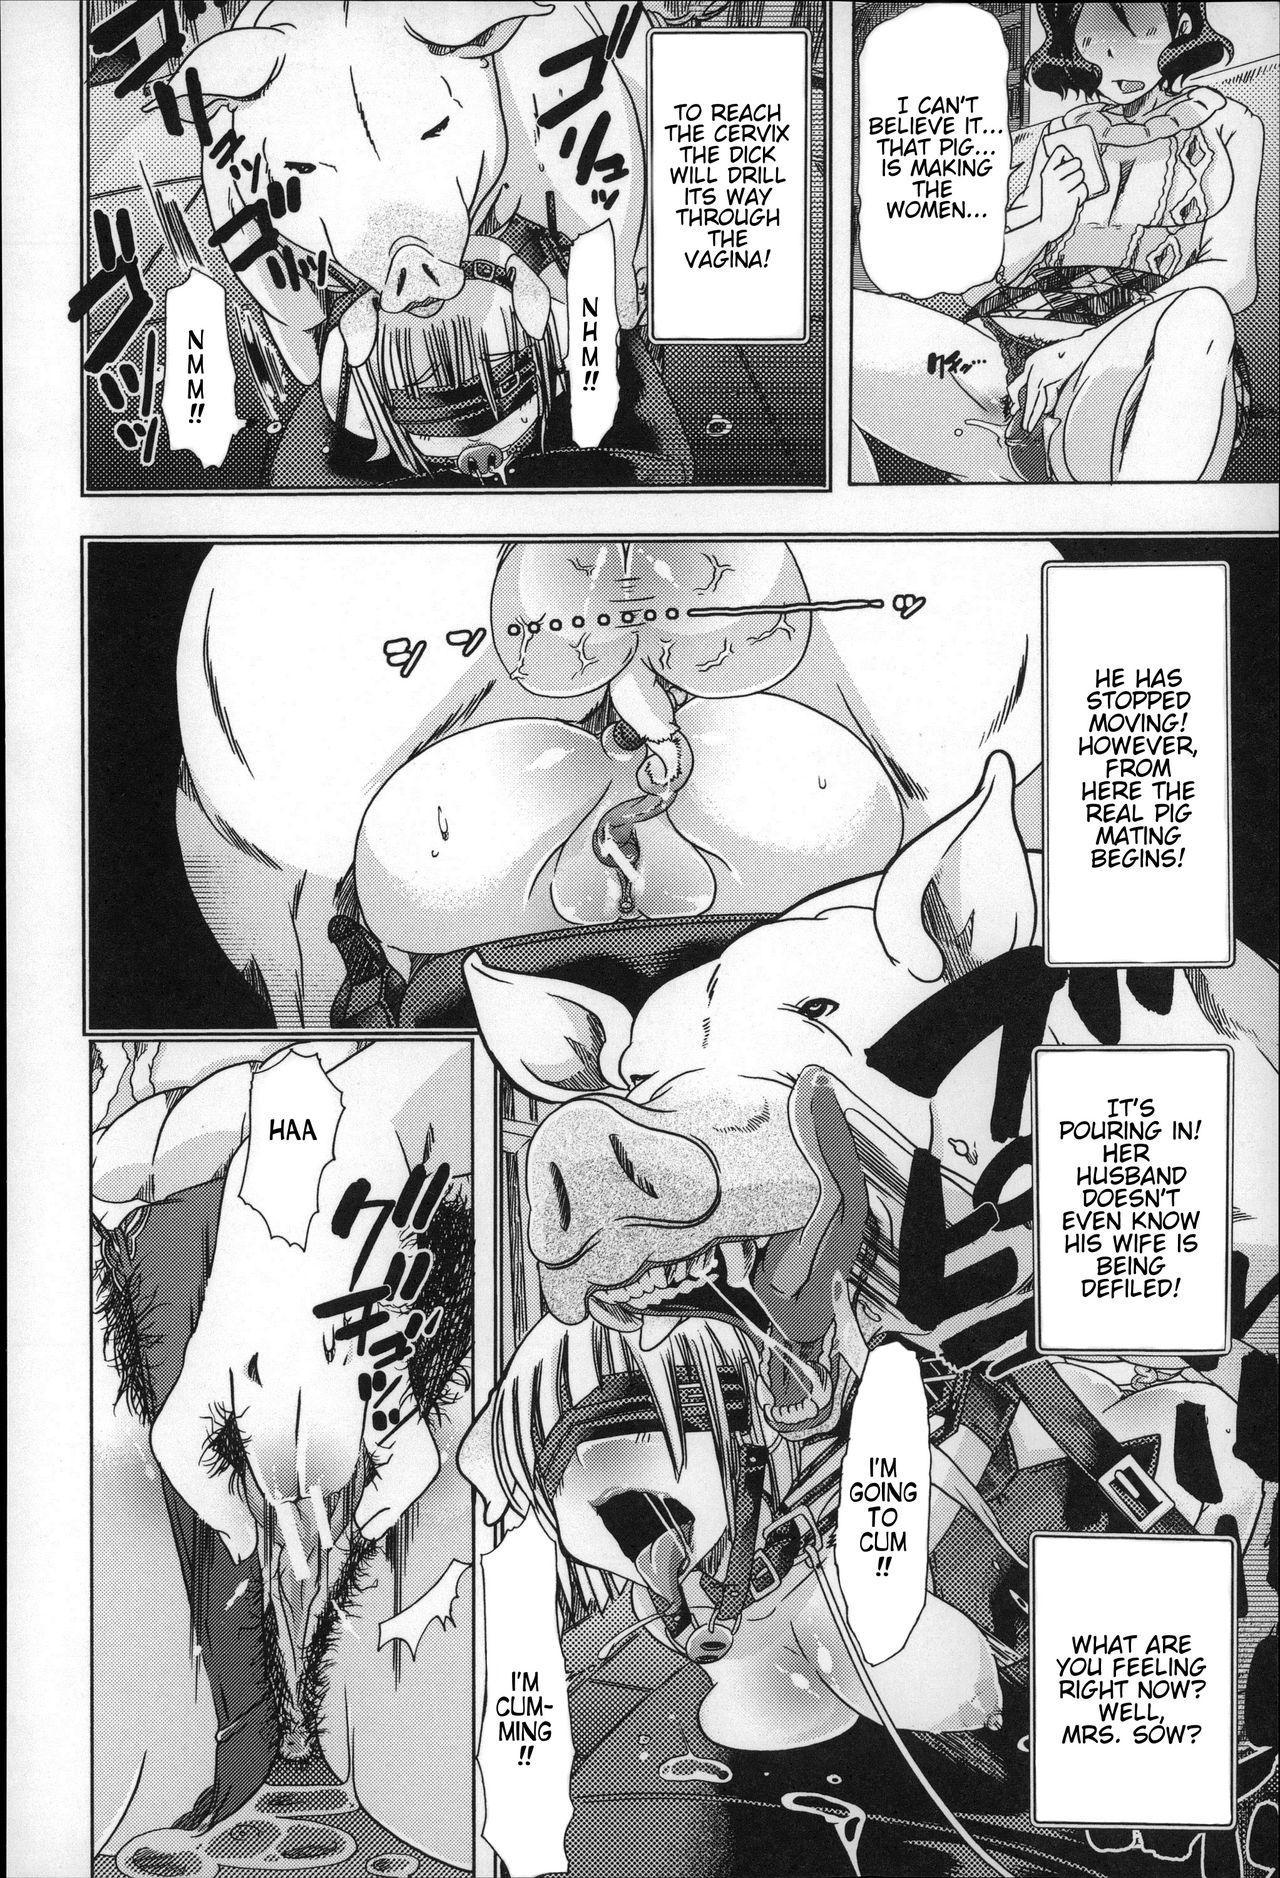 [Chikiko] Juukan - Tonkatsu   Bestiality - Pork Life (Cutlet) (Juukan Nikubenki Kasumi) [English] [Neeko7] 7